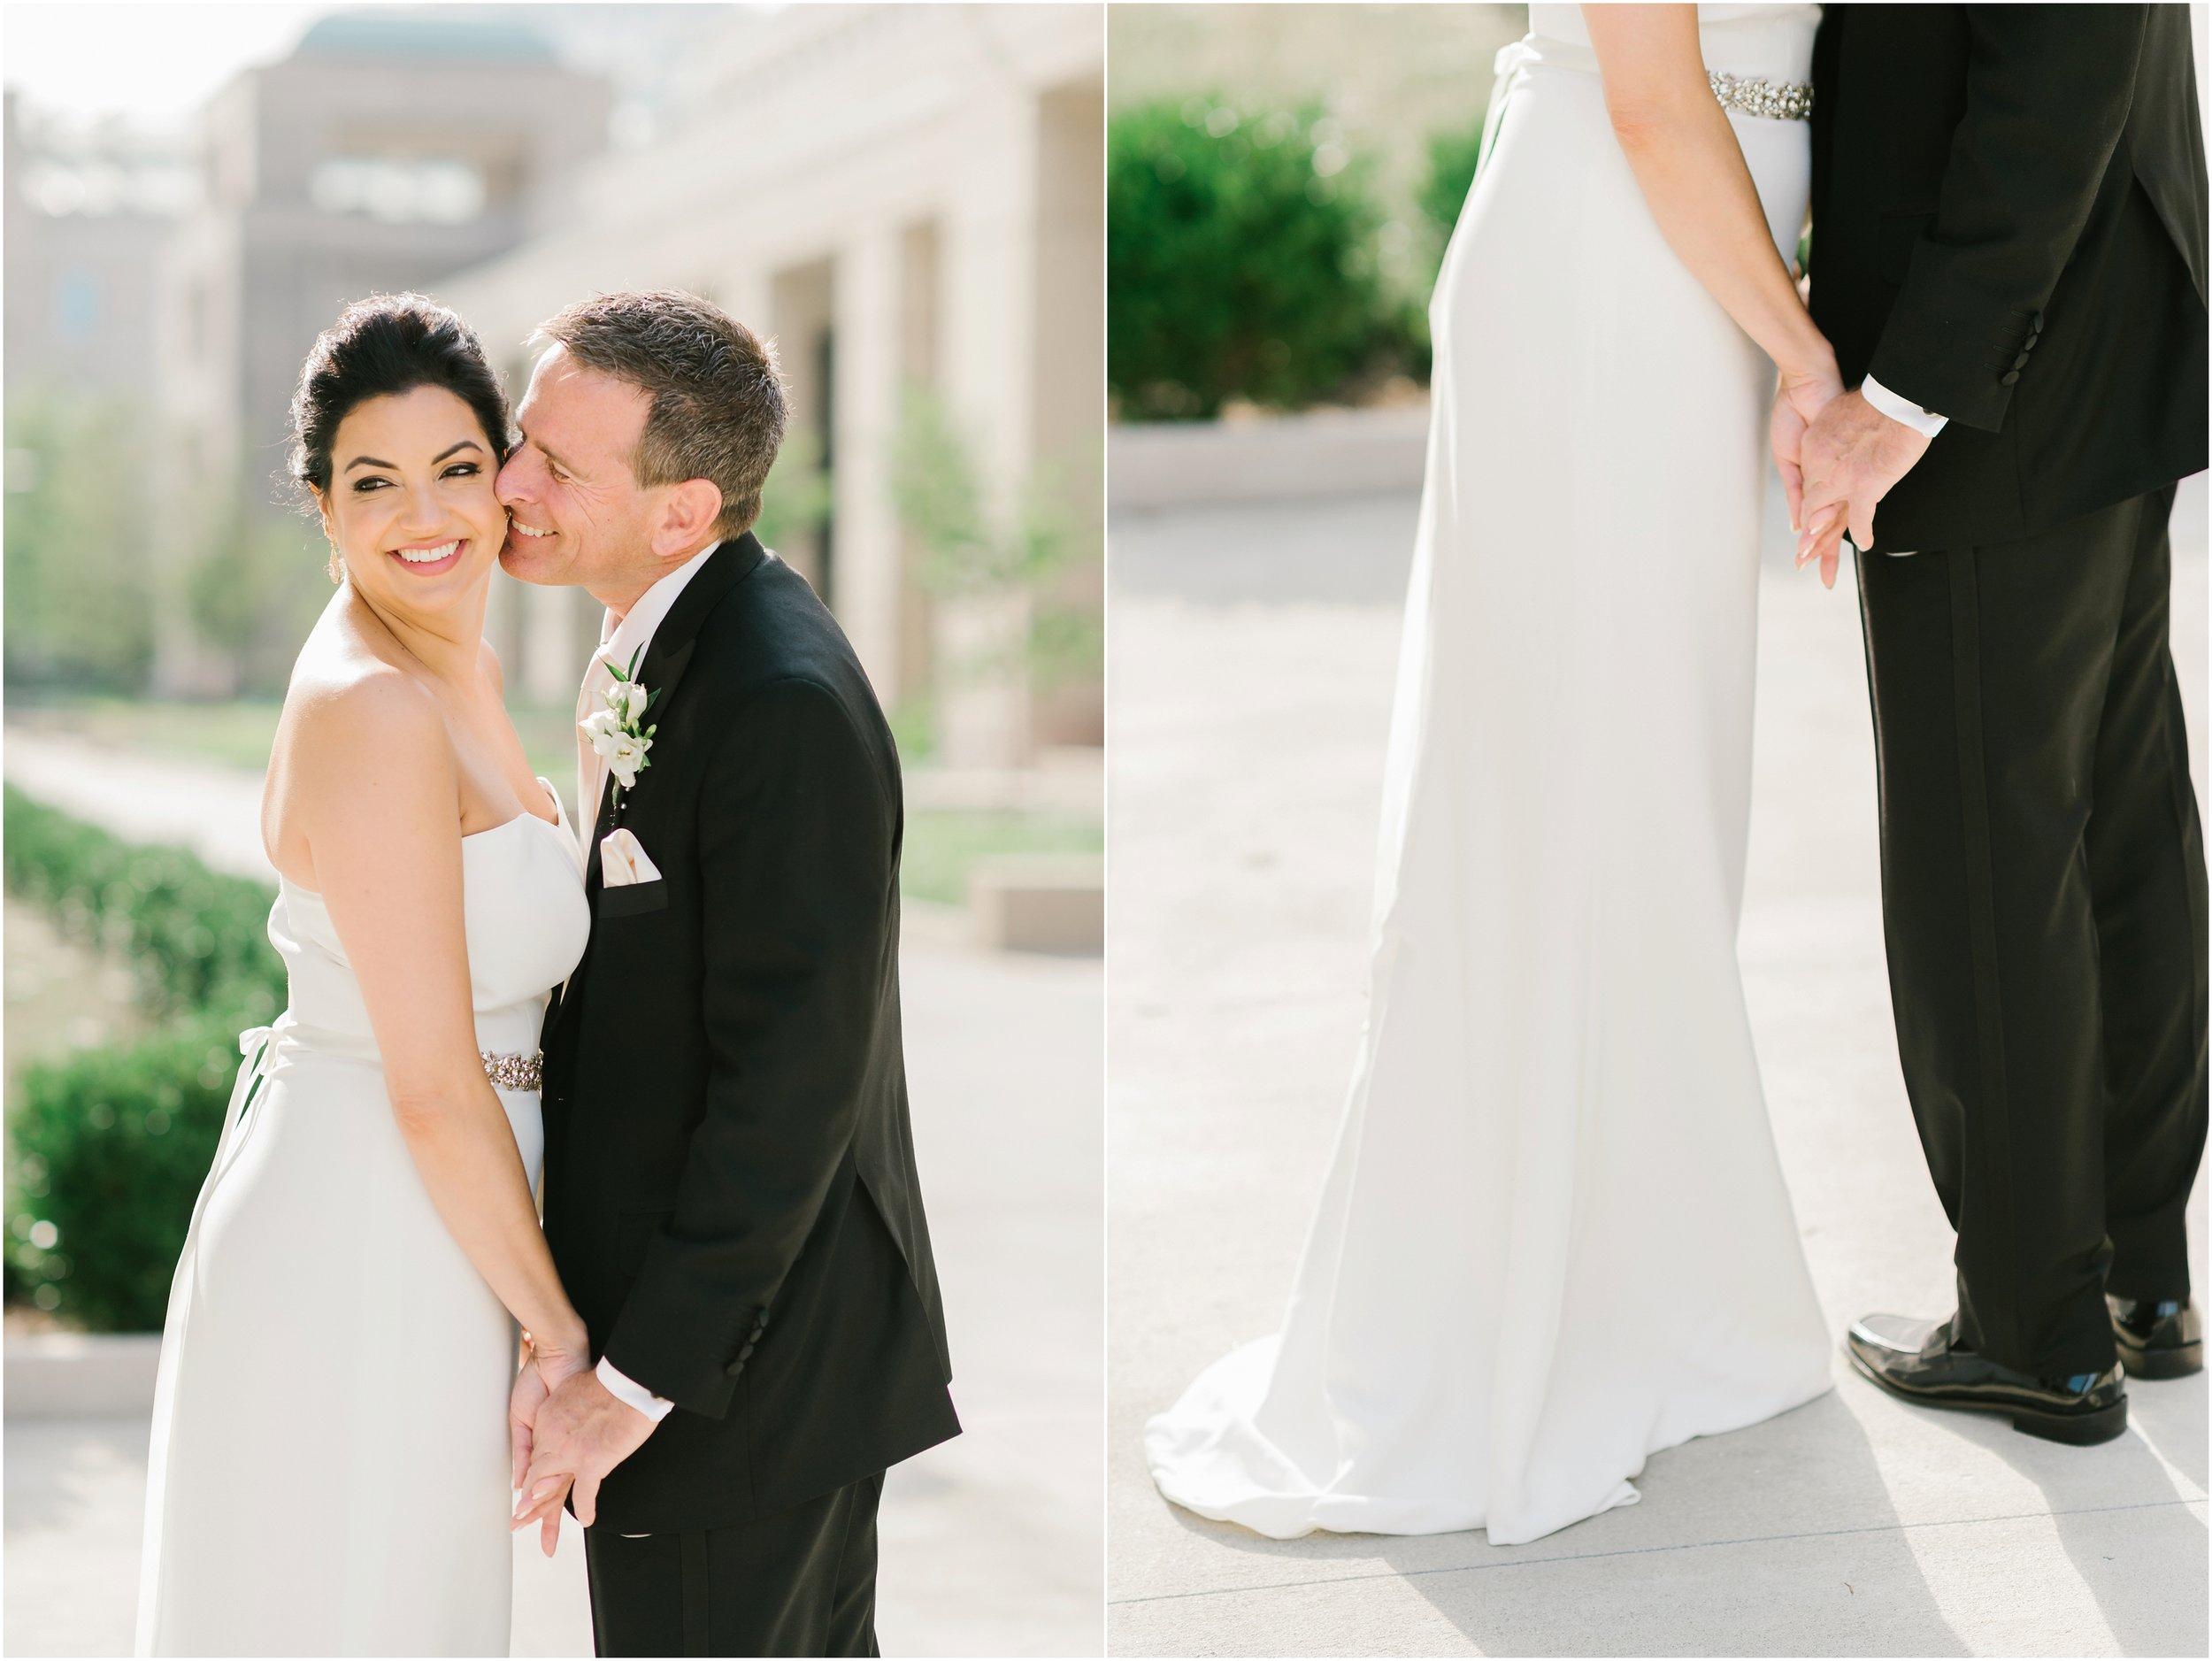 Rebecca_Shehorn_Photography_Indianapolis_Wedding_Photographer_8548.jpg